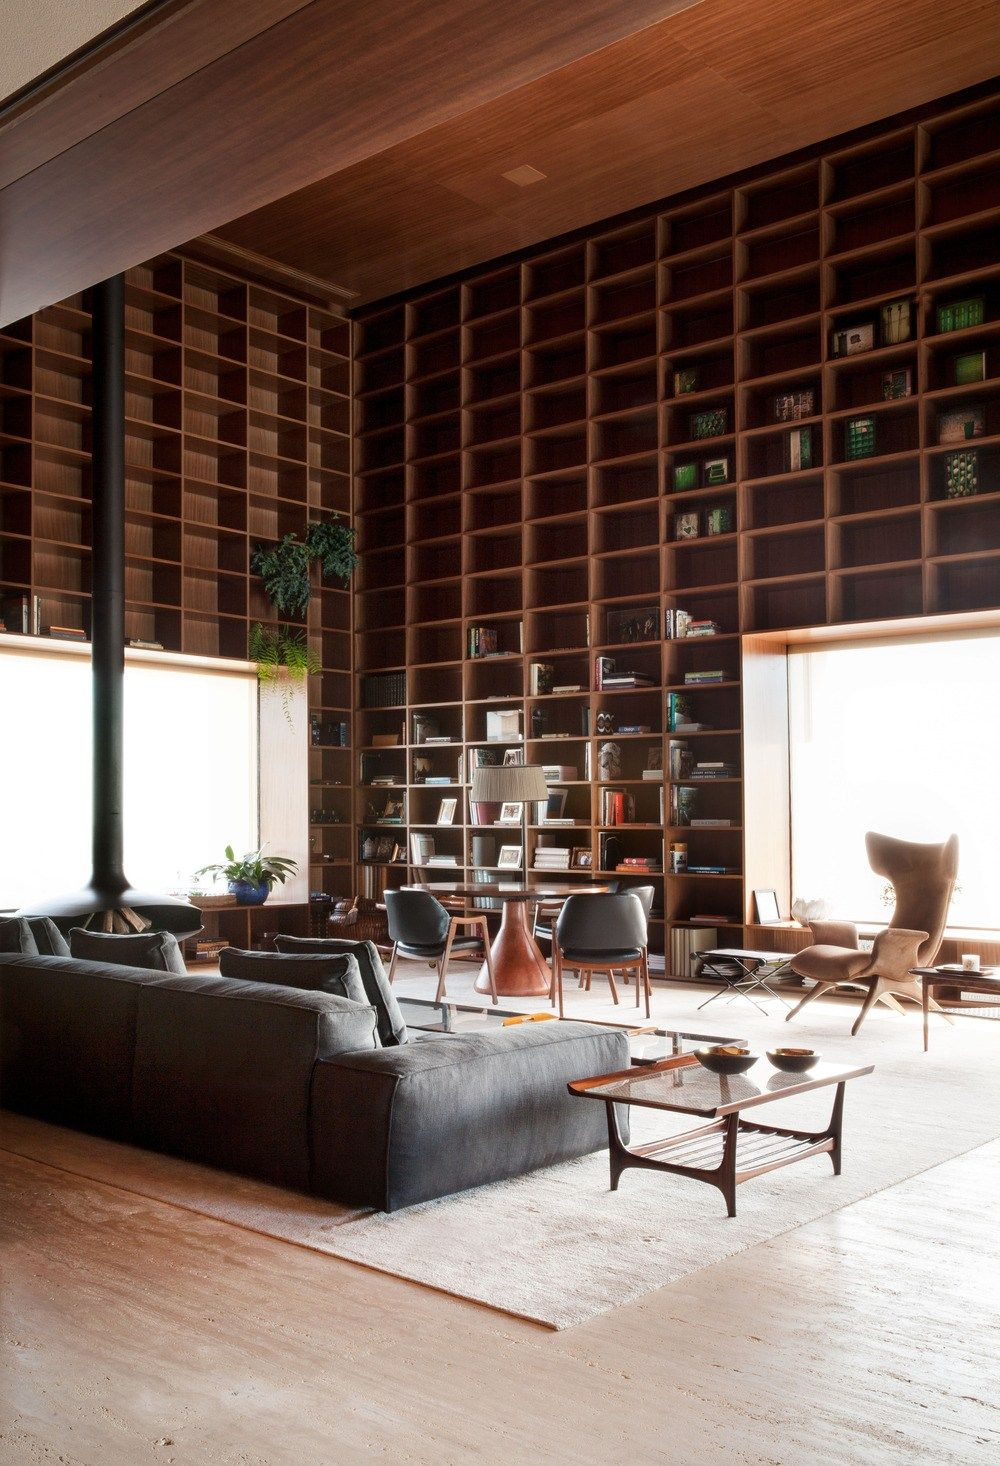 Jonas bjerre poulsen espacio interior dise o casas for Arquitectura y diseno de casas modernas